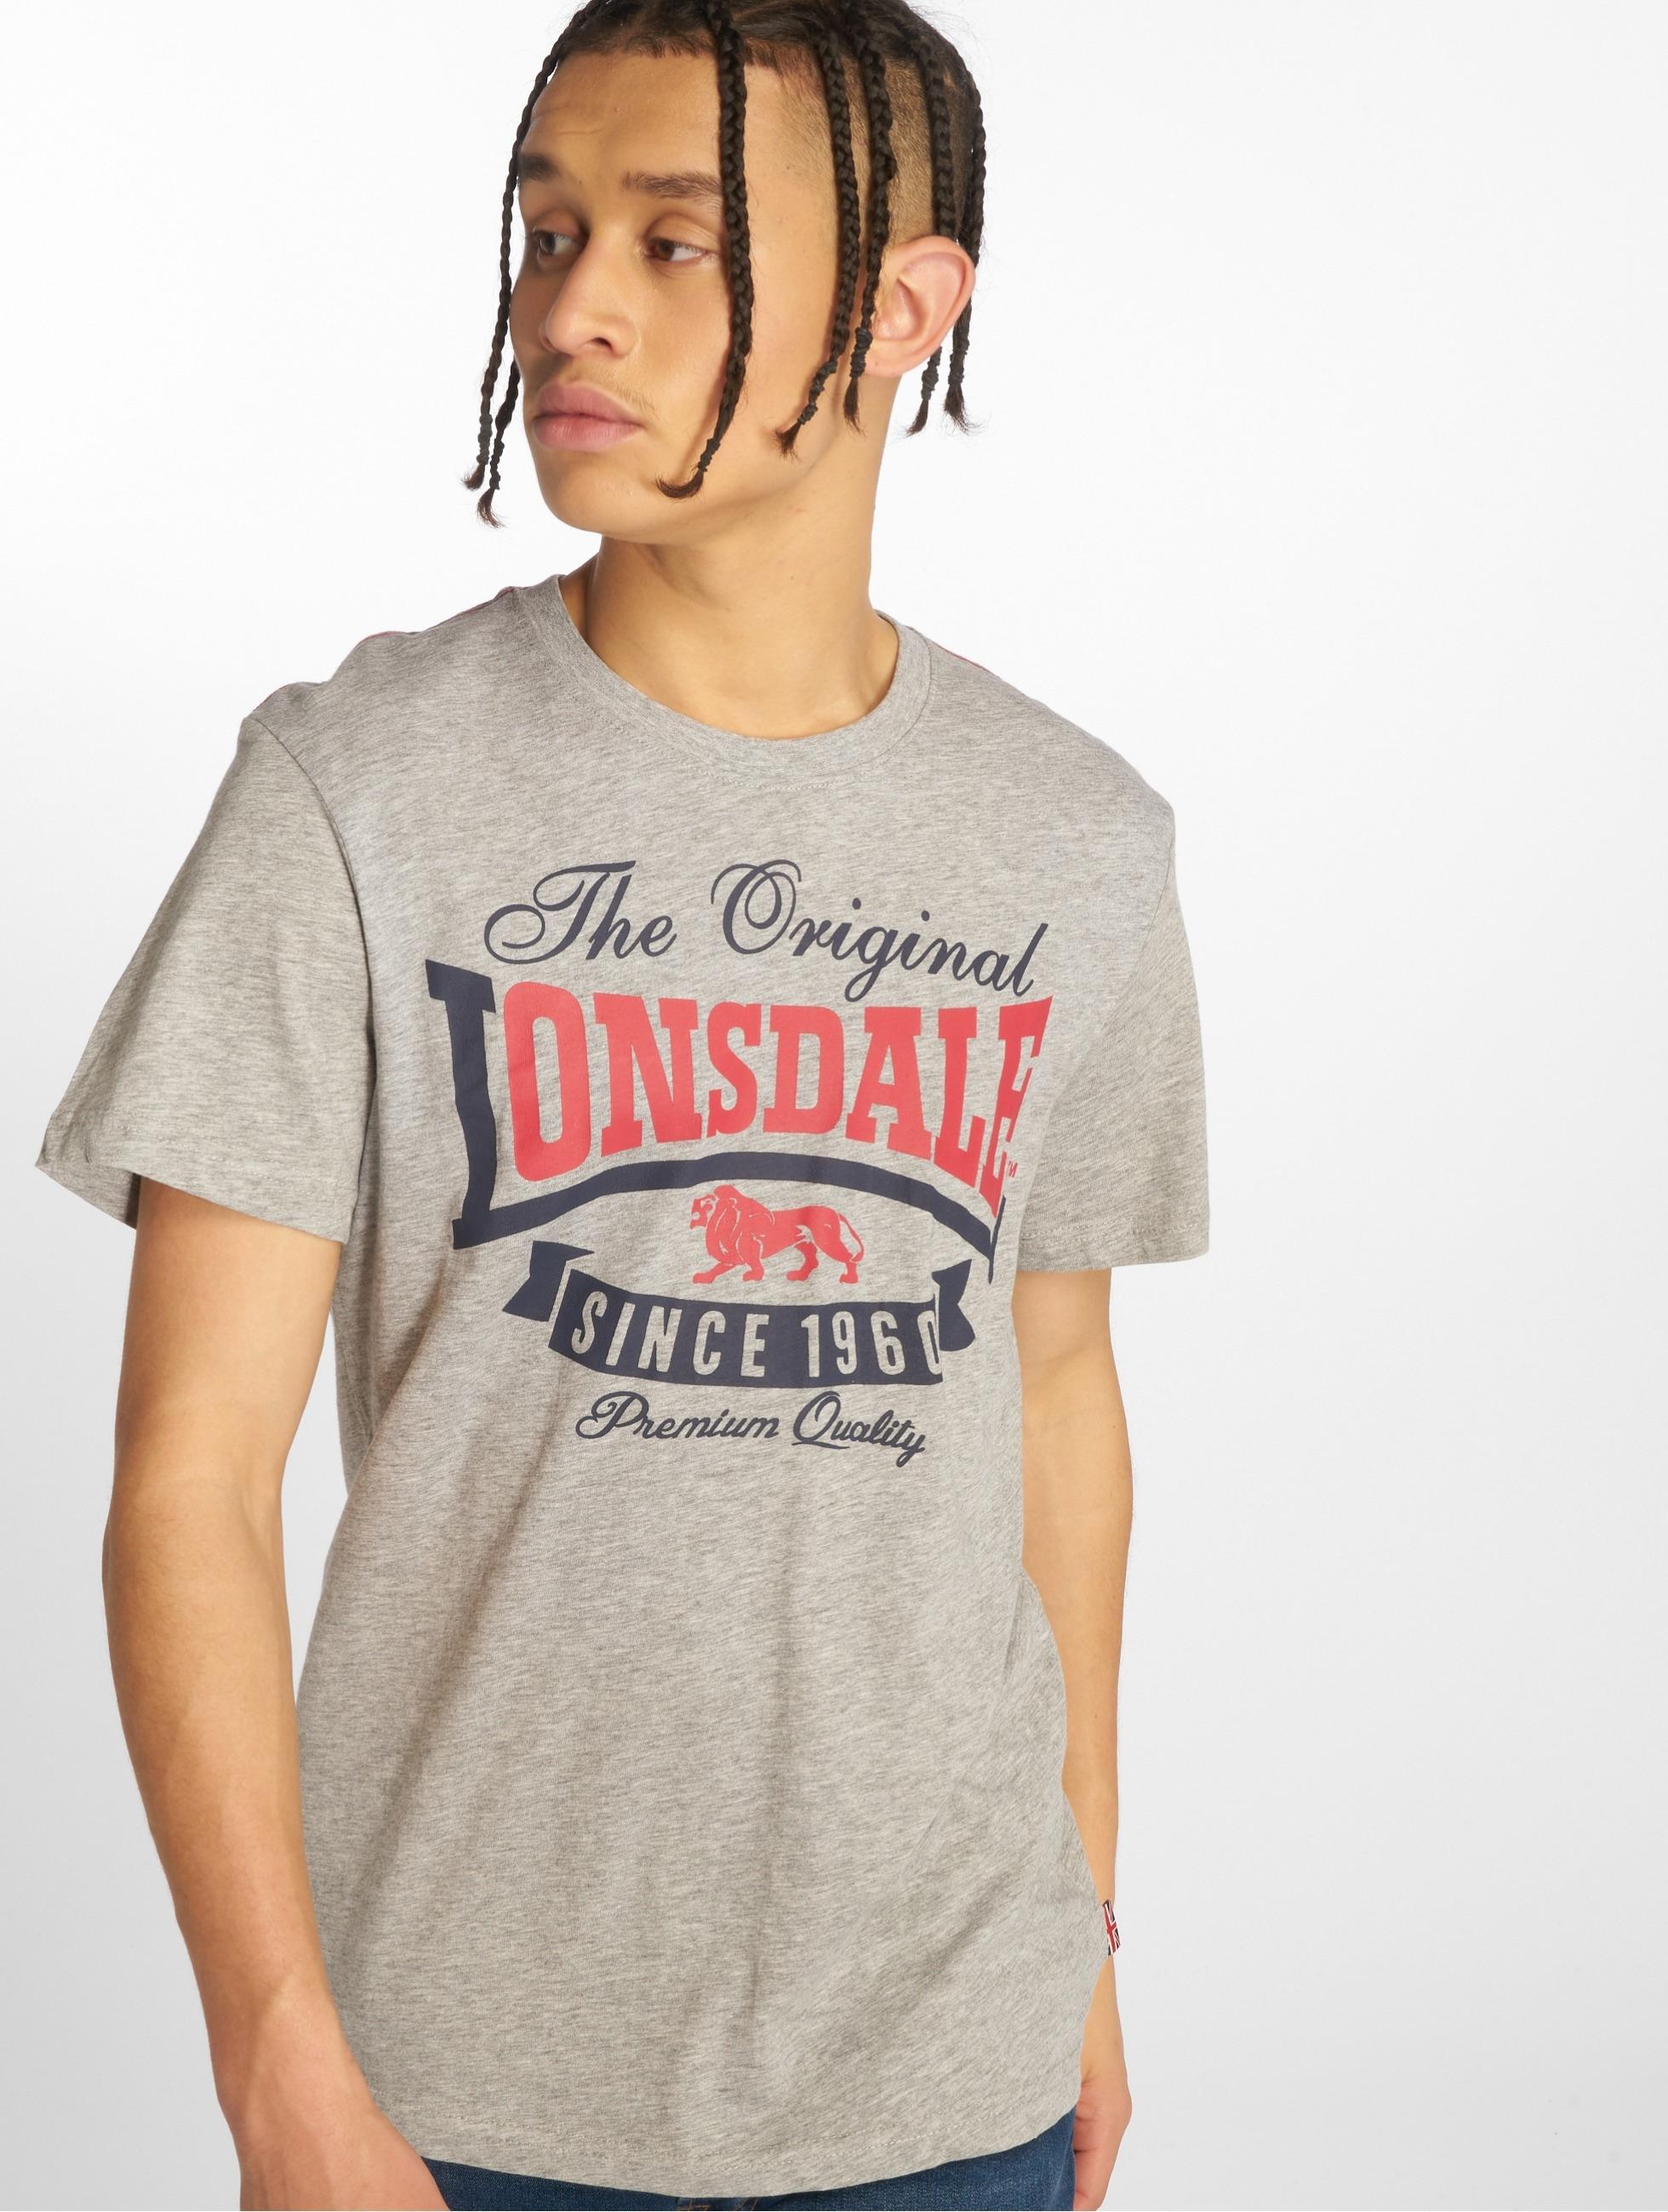 Grau Mellange Lonsdale T-Shirt Langsett